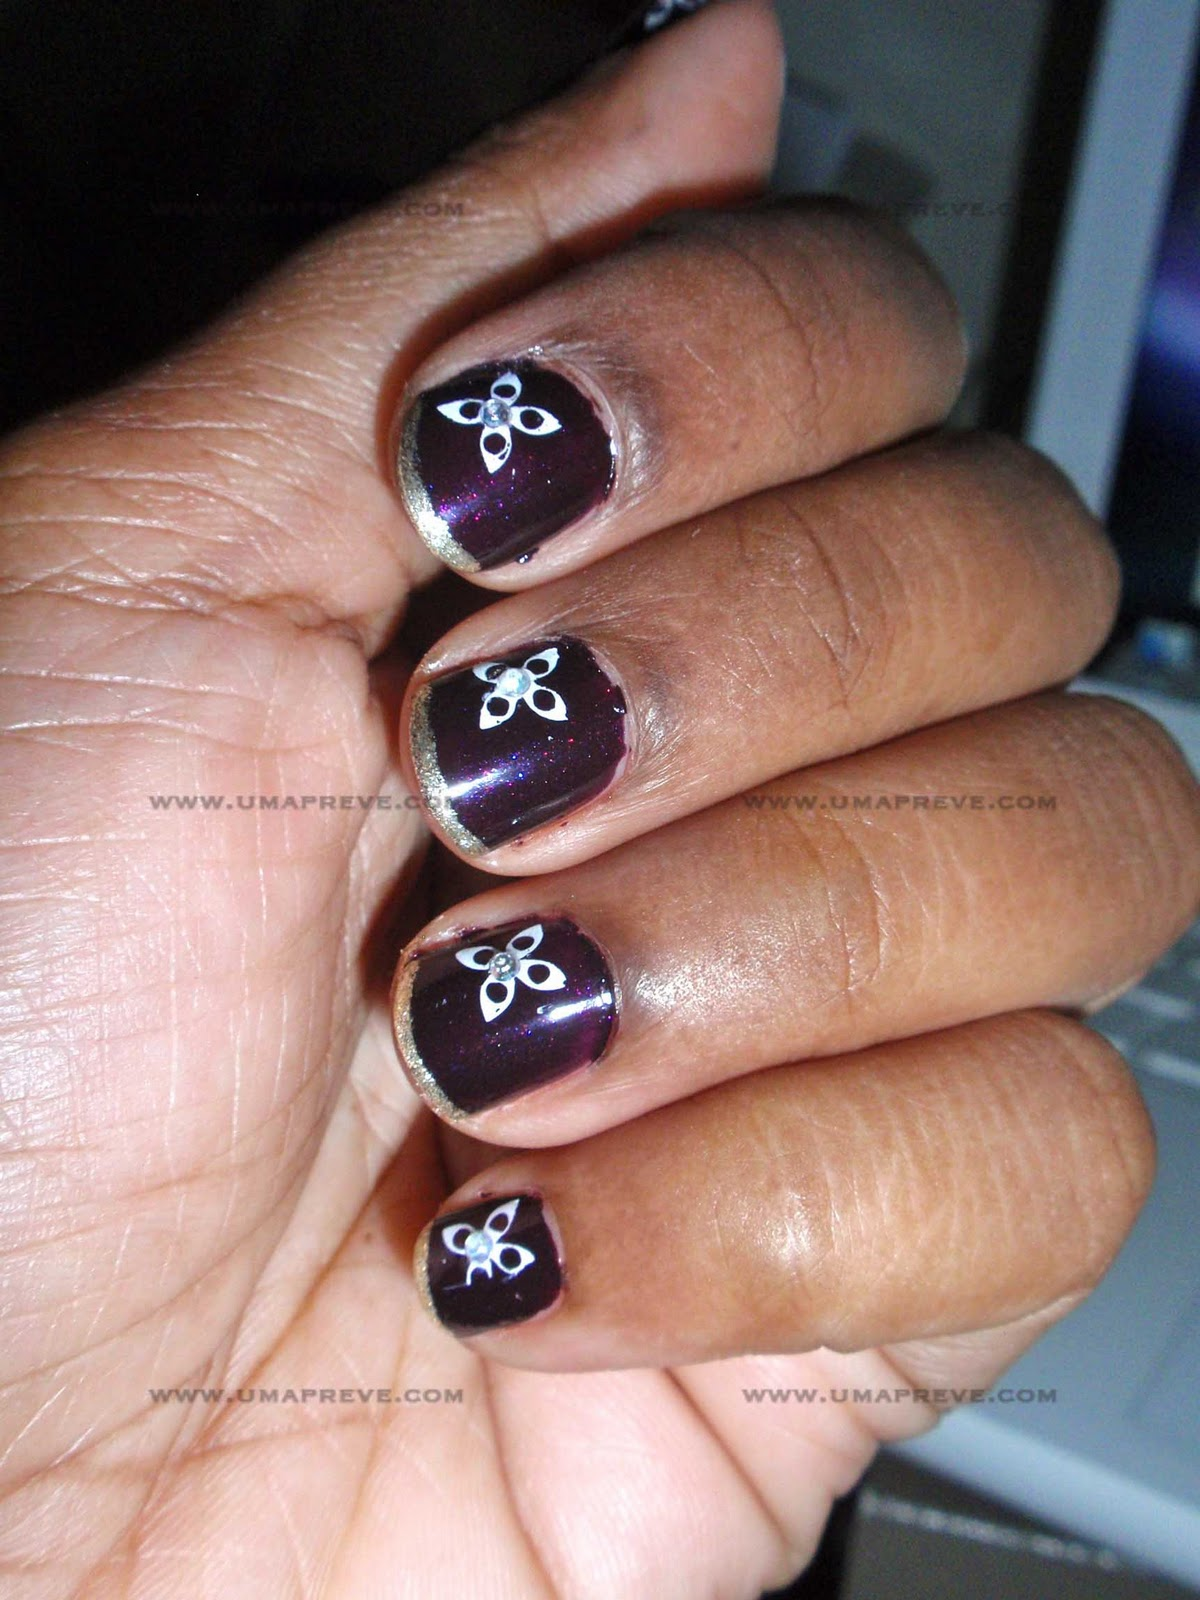 My Nail Polish Obsession My Birthday Nails: UmaMakeupHDTV: My Nail Interest: Konad Nail Art & Gel Nails